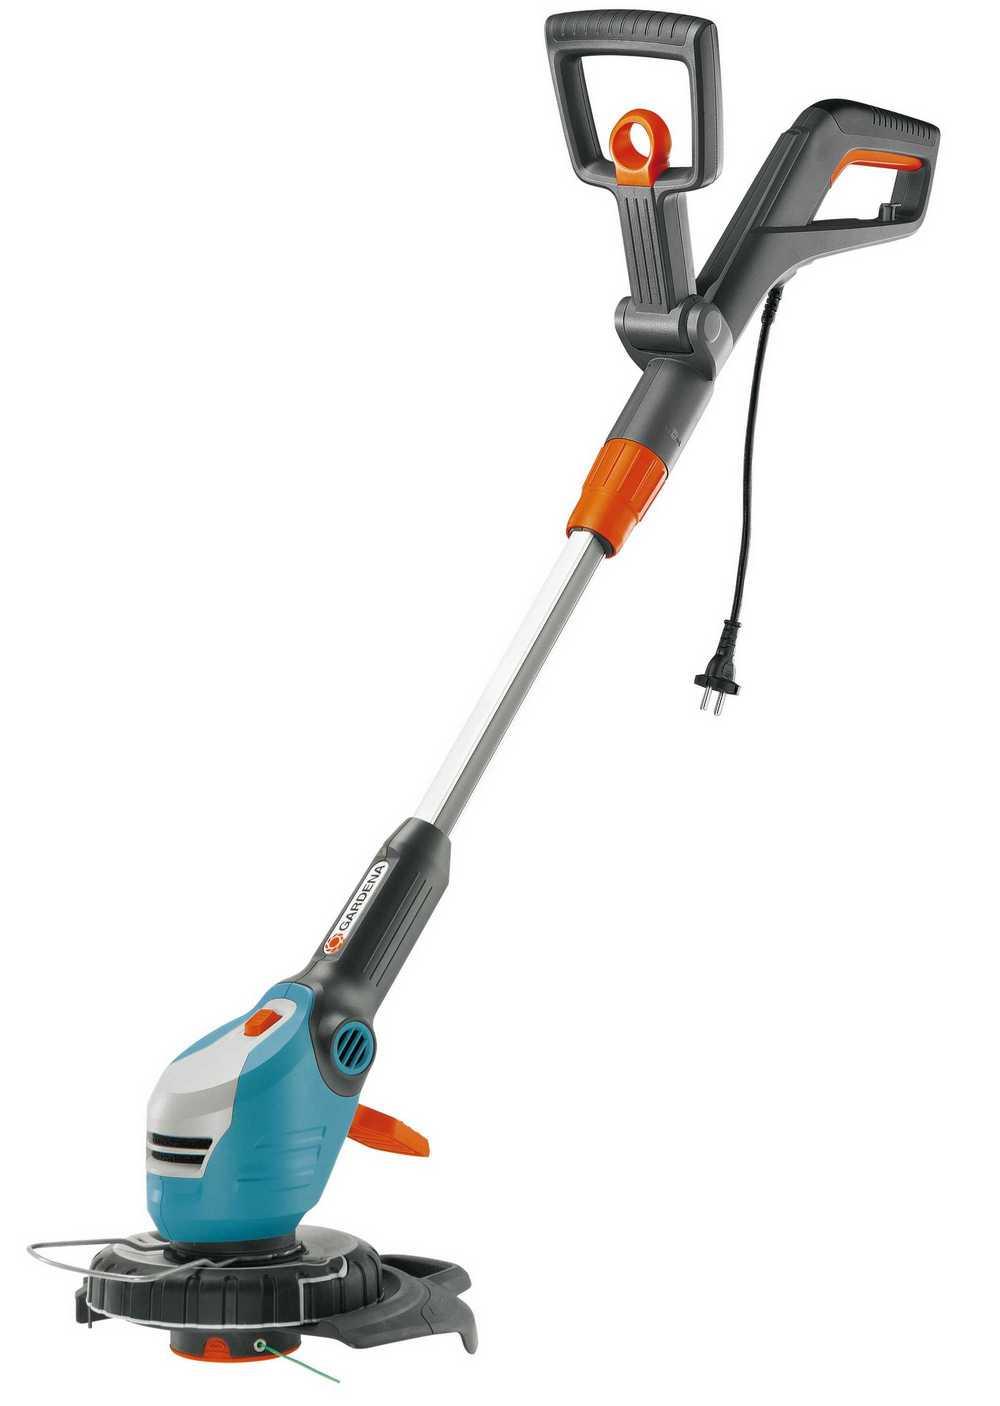 Powercut trimmer plus 650/30